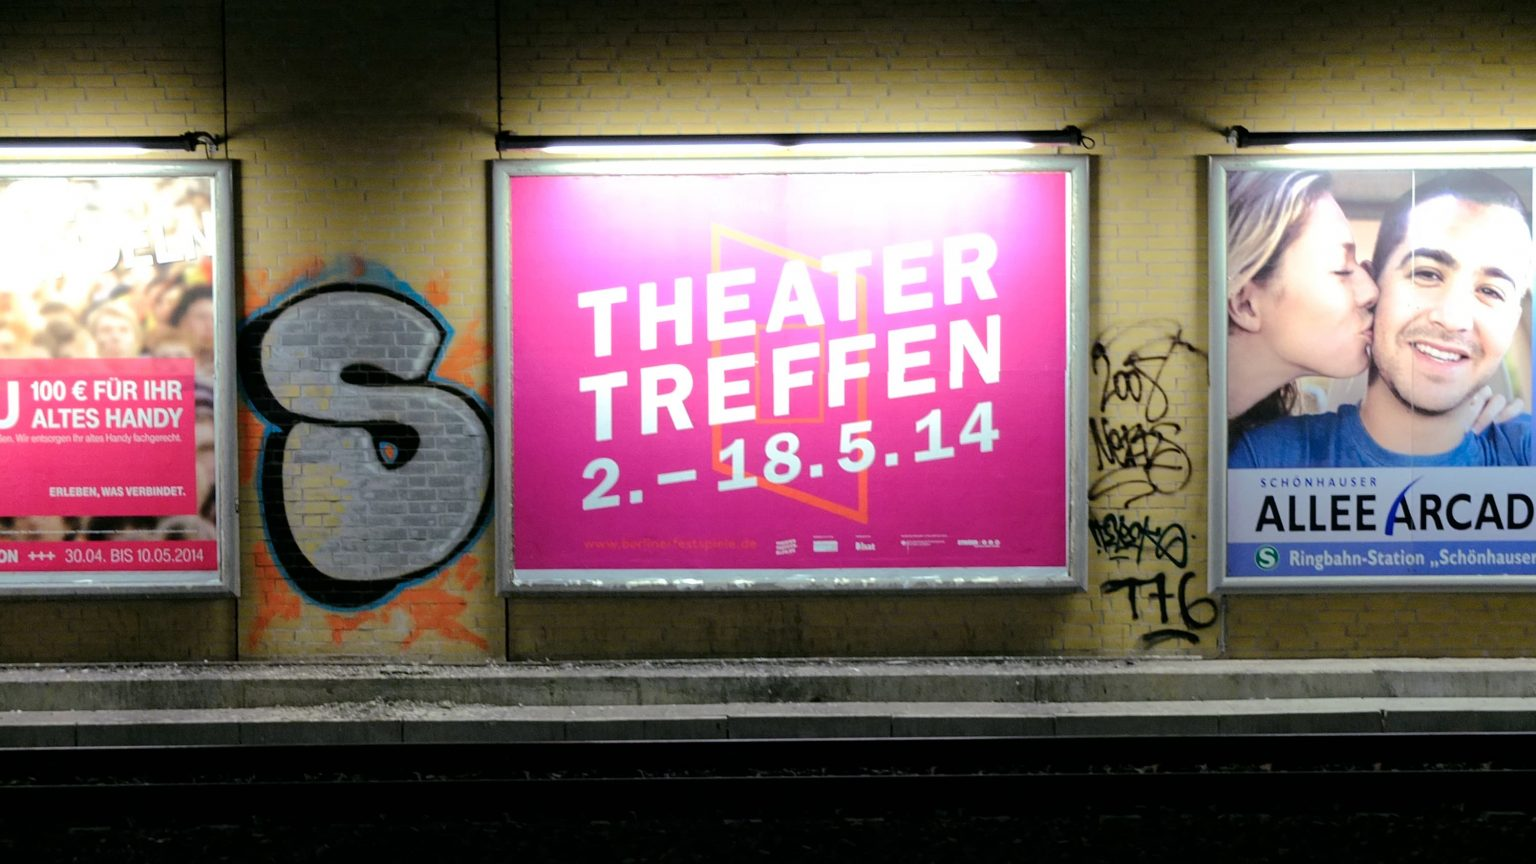 Ta-Trung Teathertreffen 01